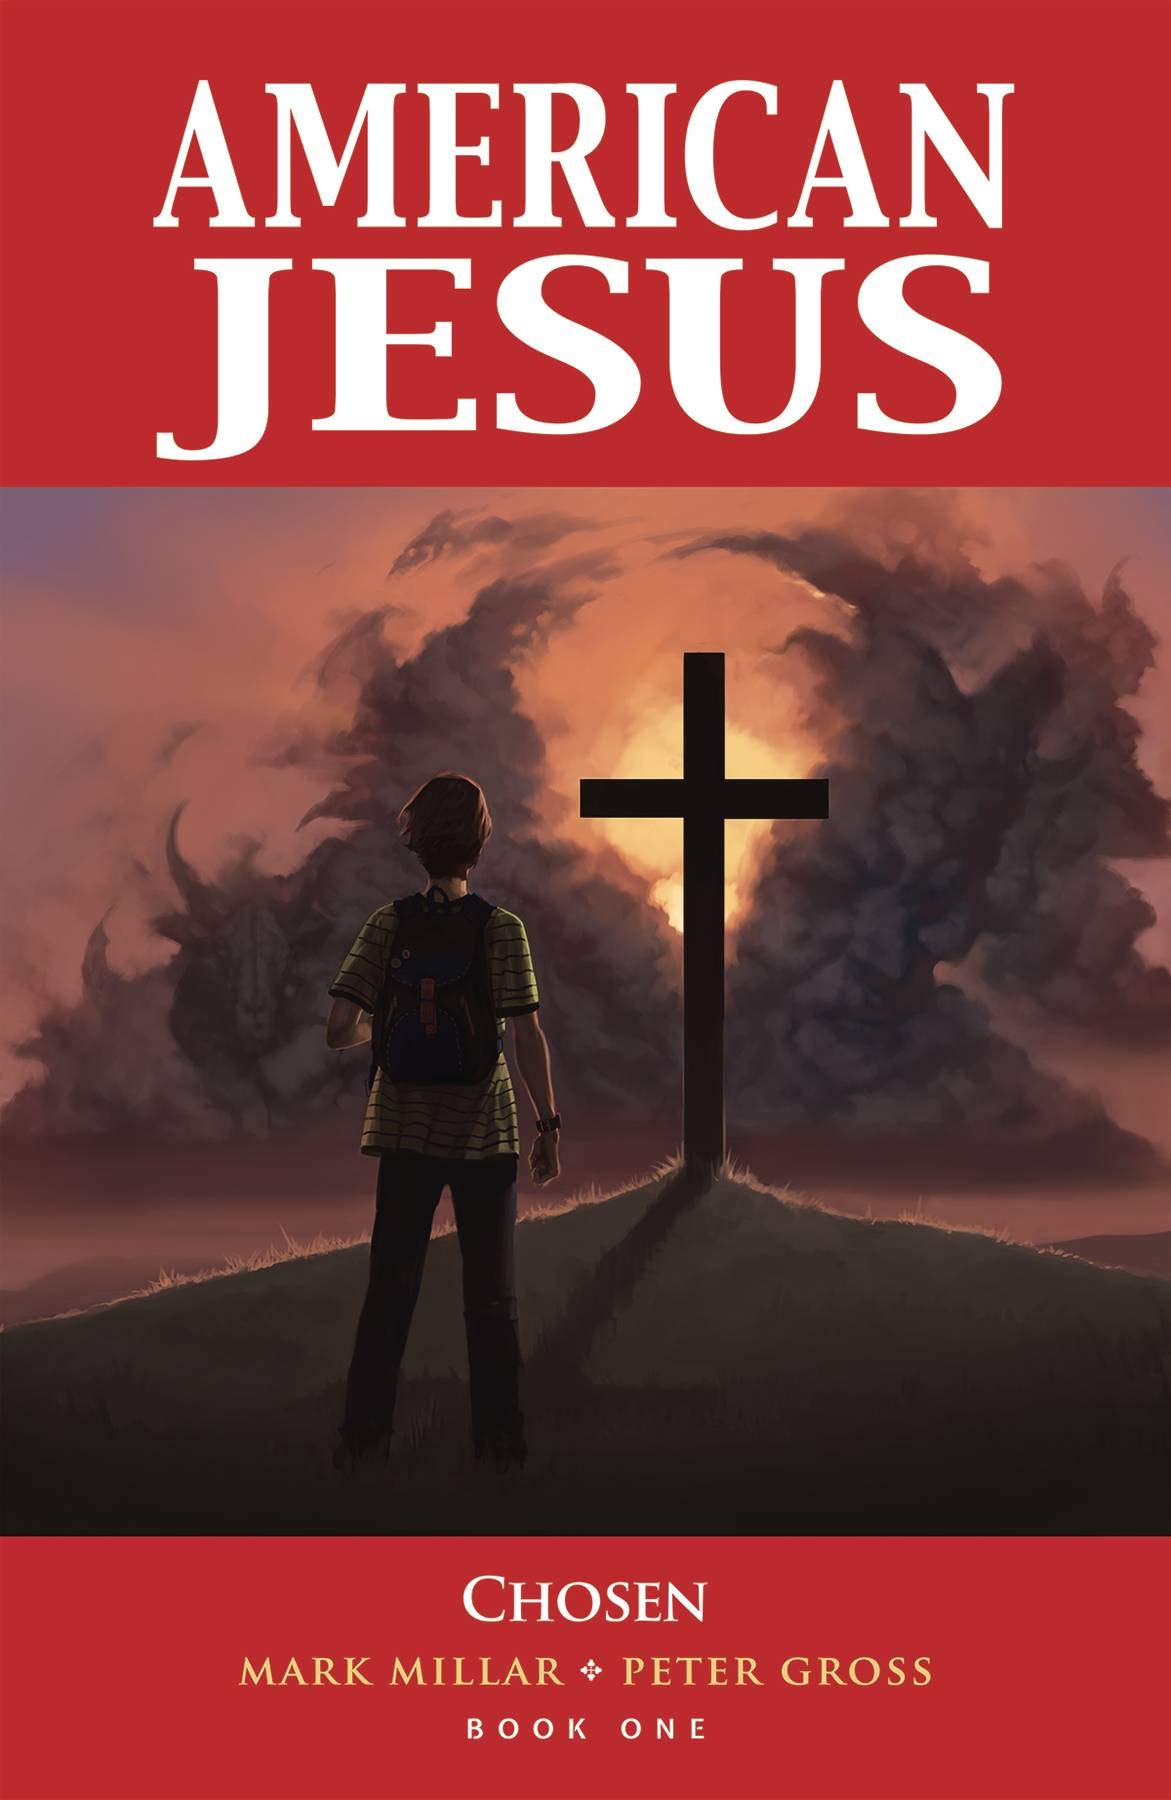 American Jesus 1 - Chosen